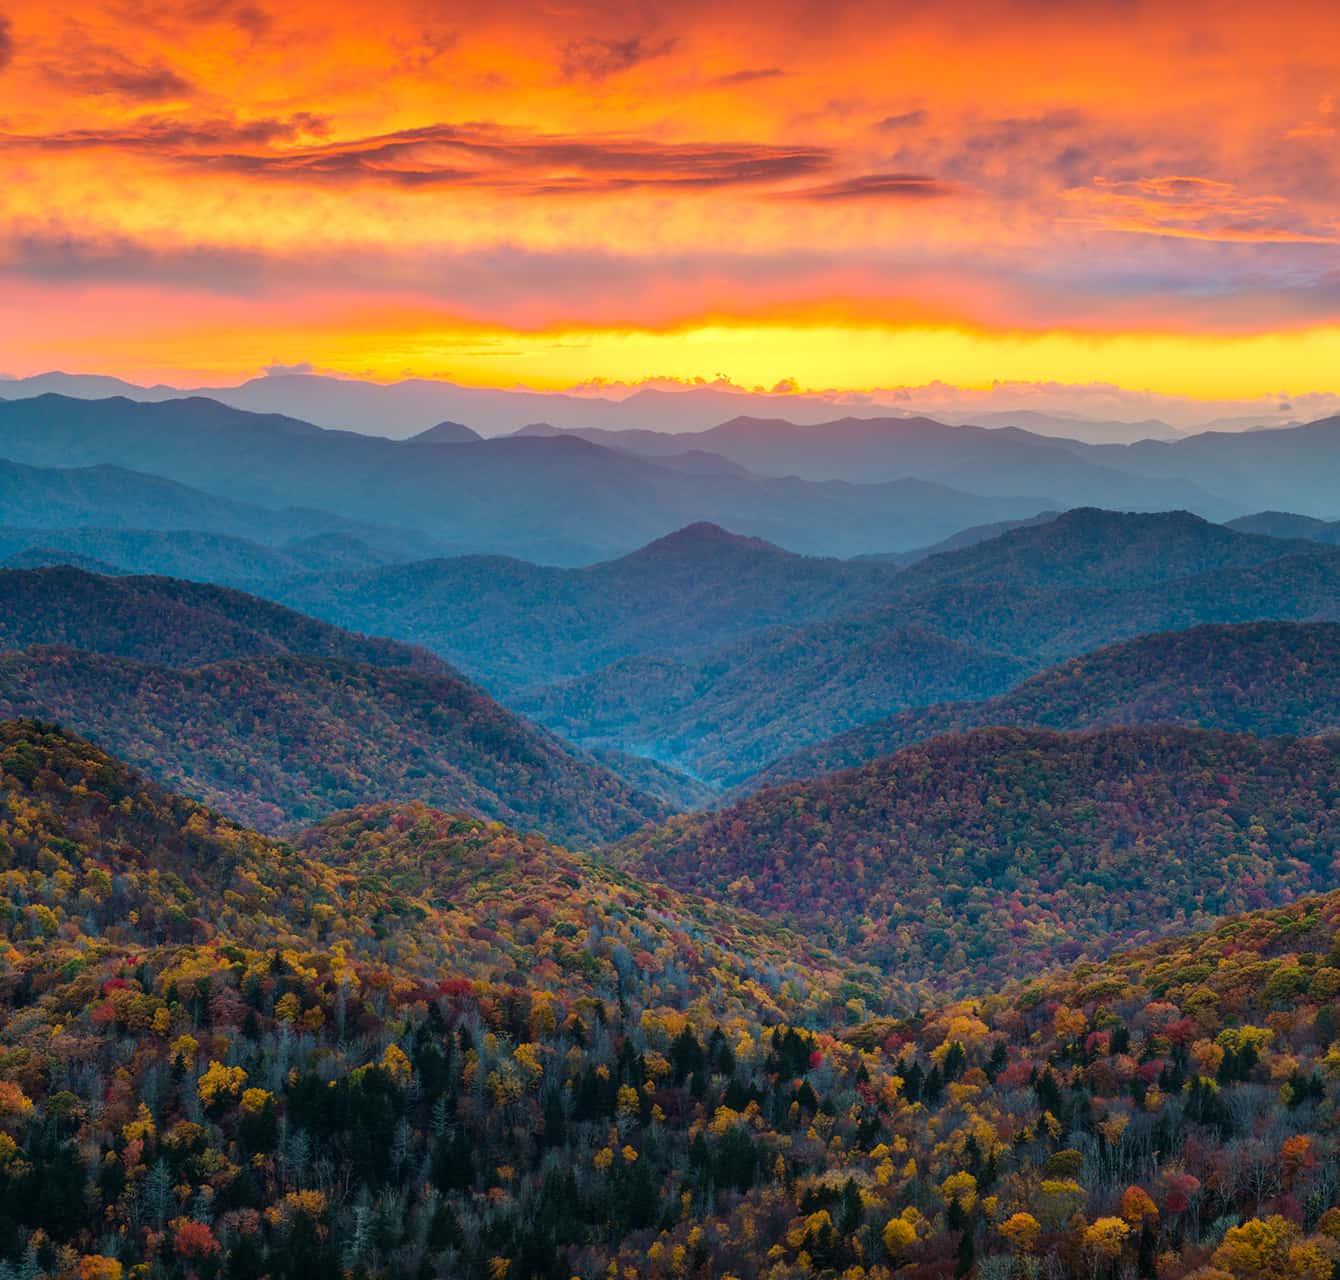 Blue Ridge Mountains in North Carolina